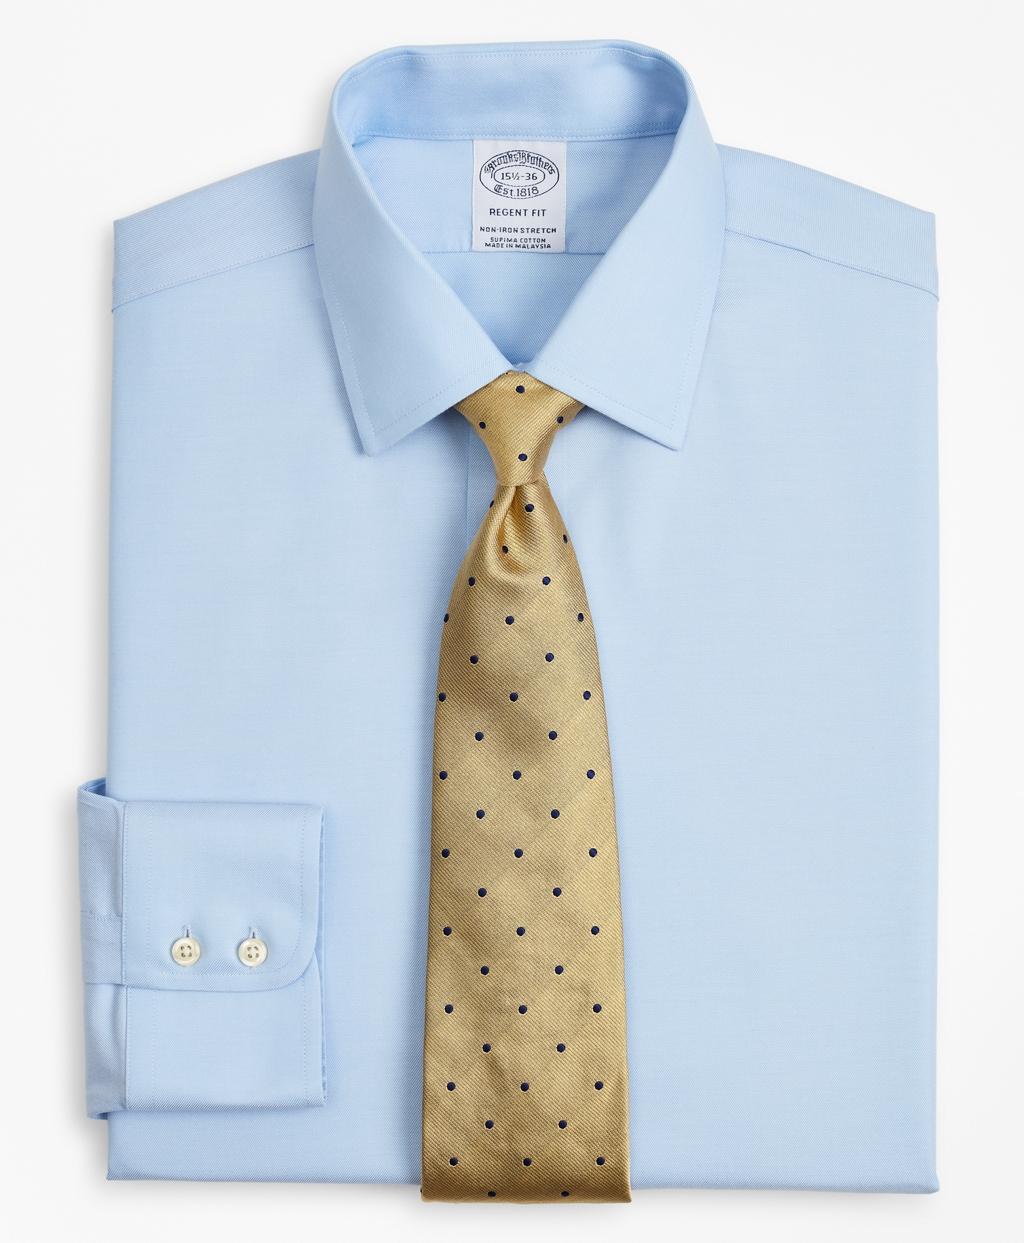 Brooksbrothers Stretch Regent Regular-Fit Dress Shirt, Non-Iron Twill Ainsley Collar